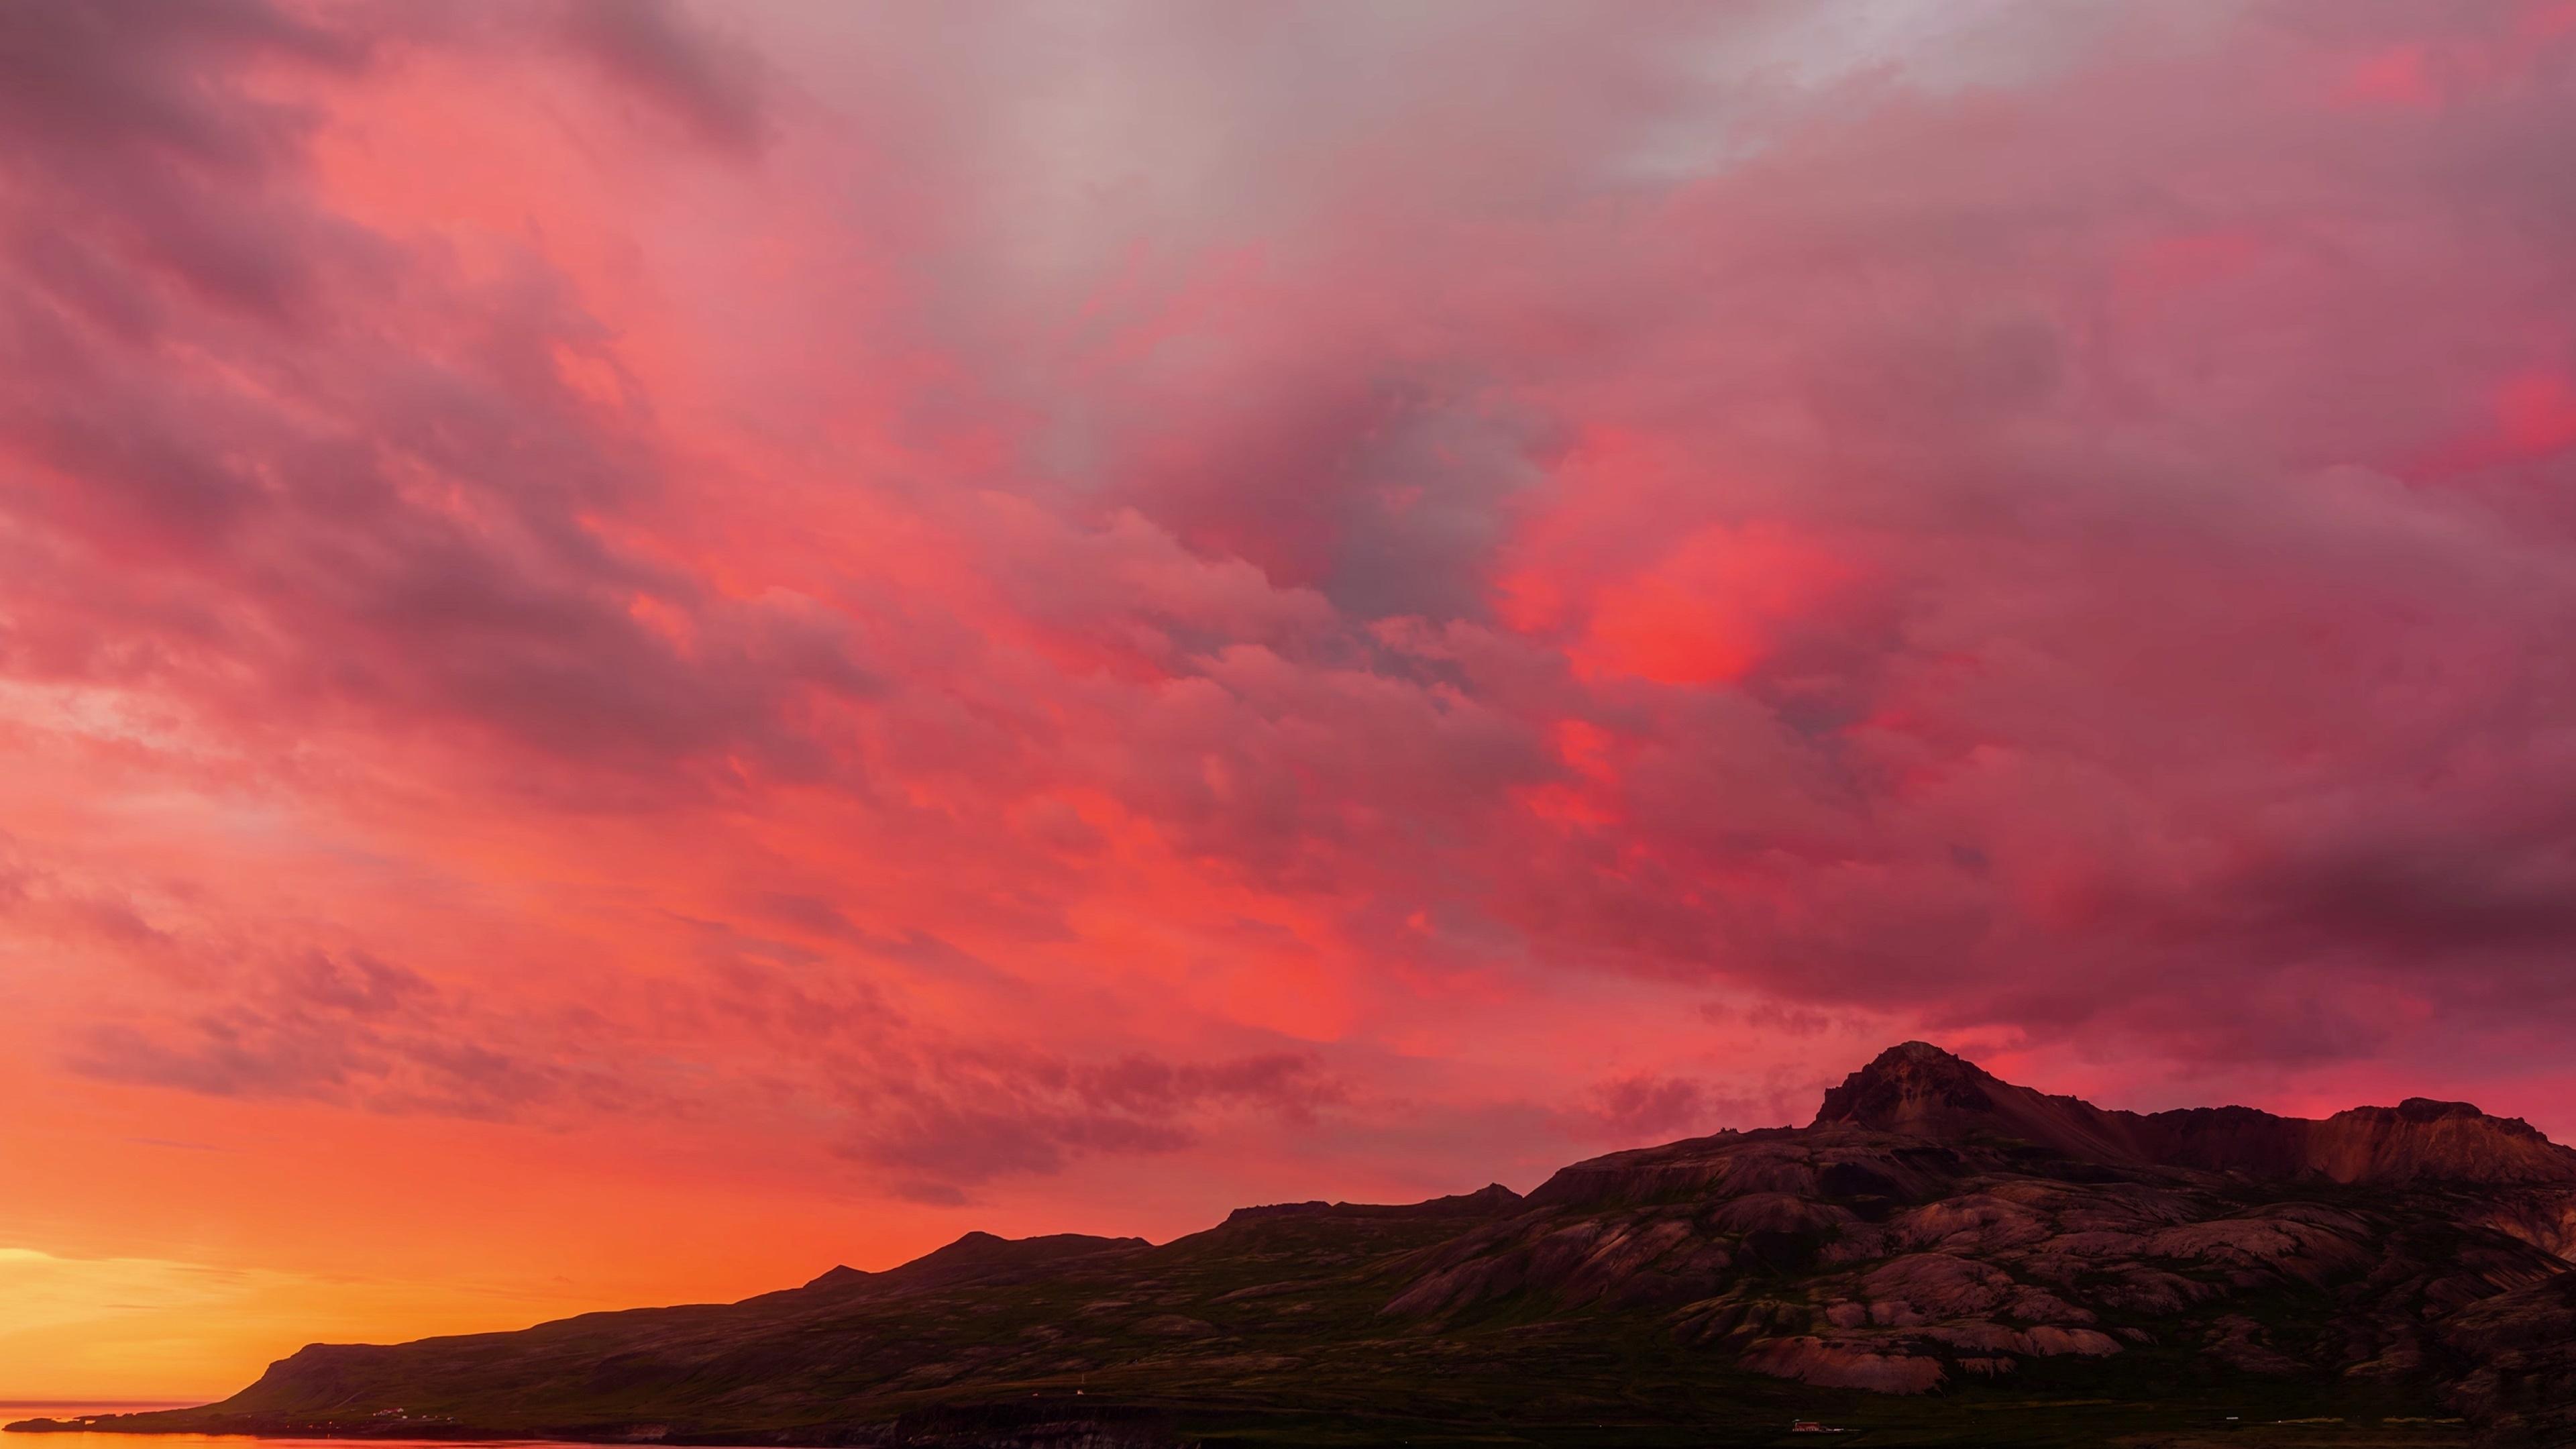 4k Colorful Sunset Wallpaper Hd Nature 4k Wallpapers